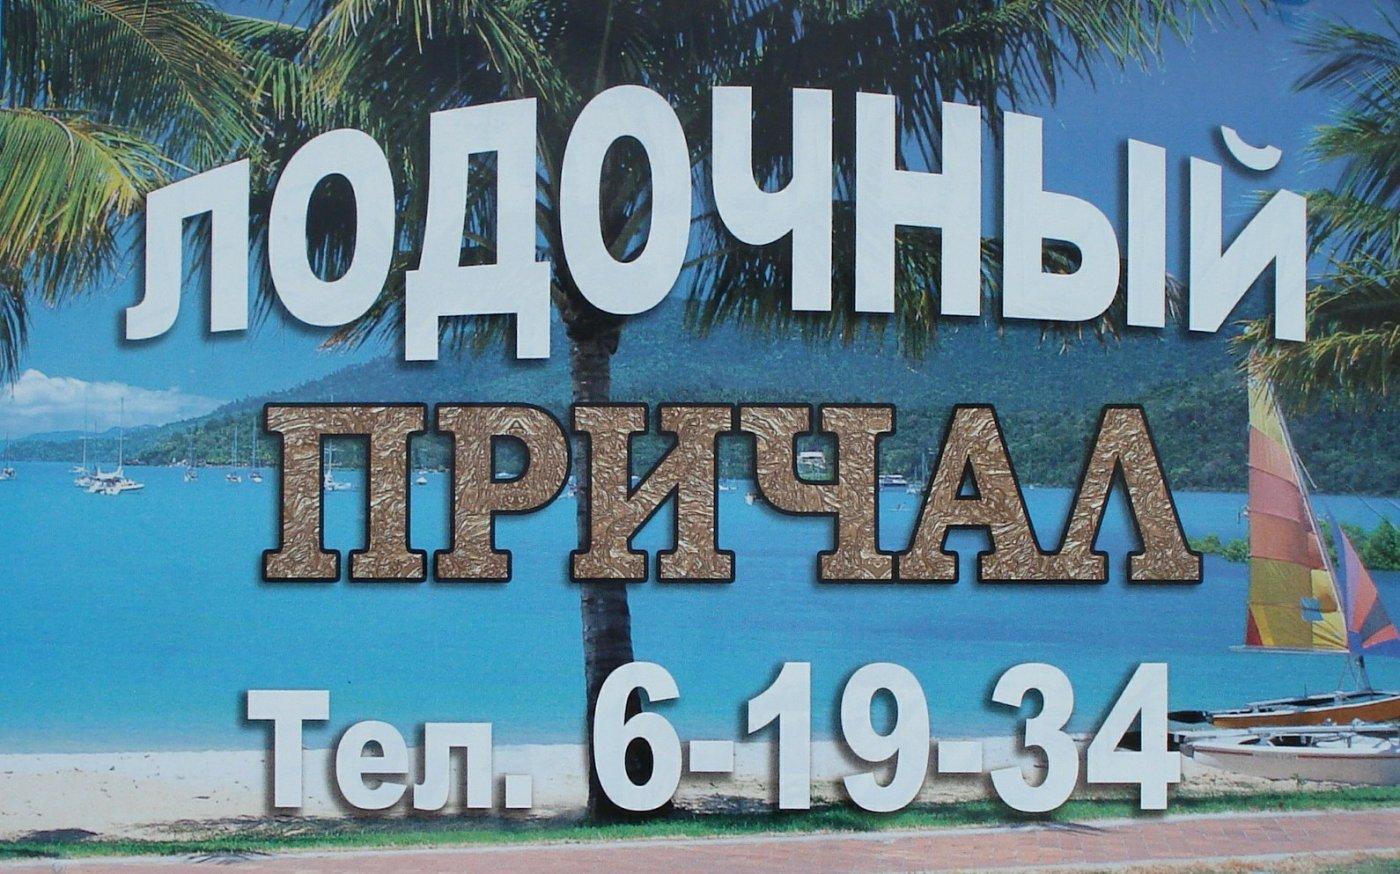 Фото vk.comlodochnuy_prichal_1 (1).JPG. Украина, Запорізька область, Дніпрорудне, Портова вулиця